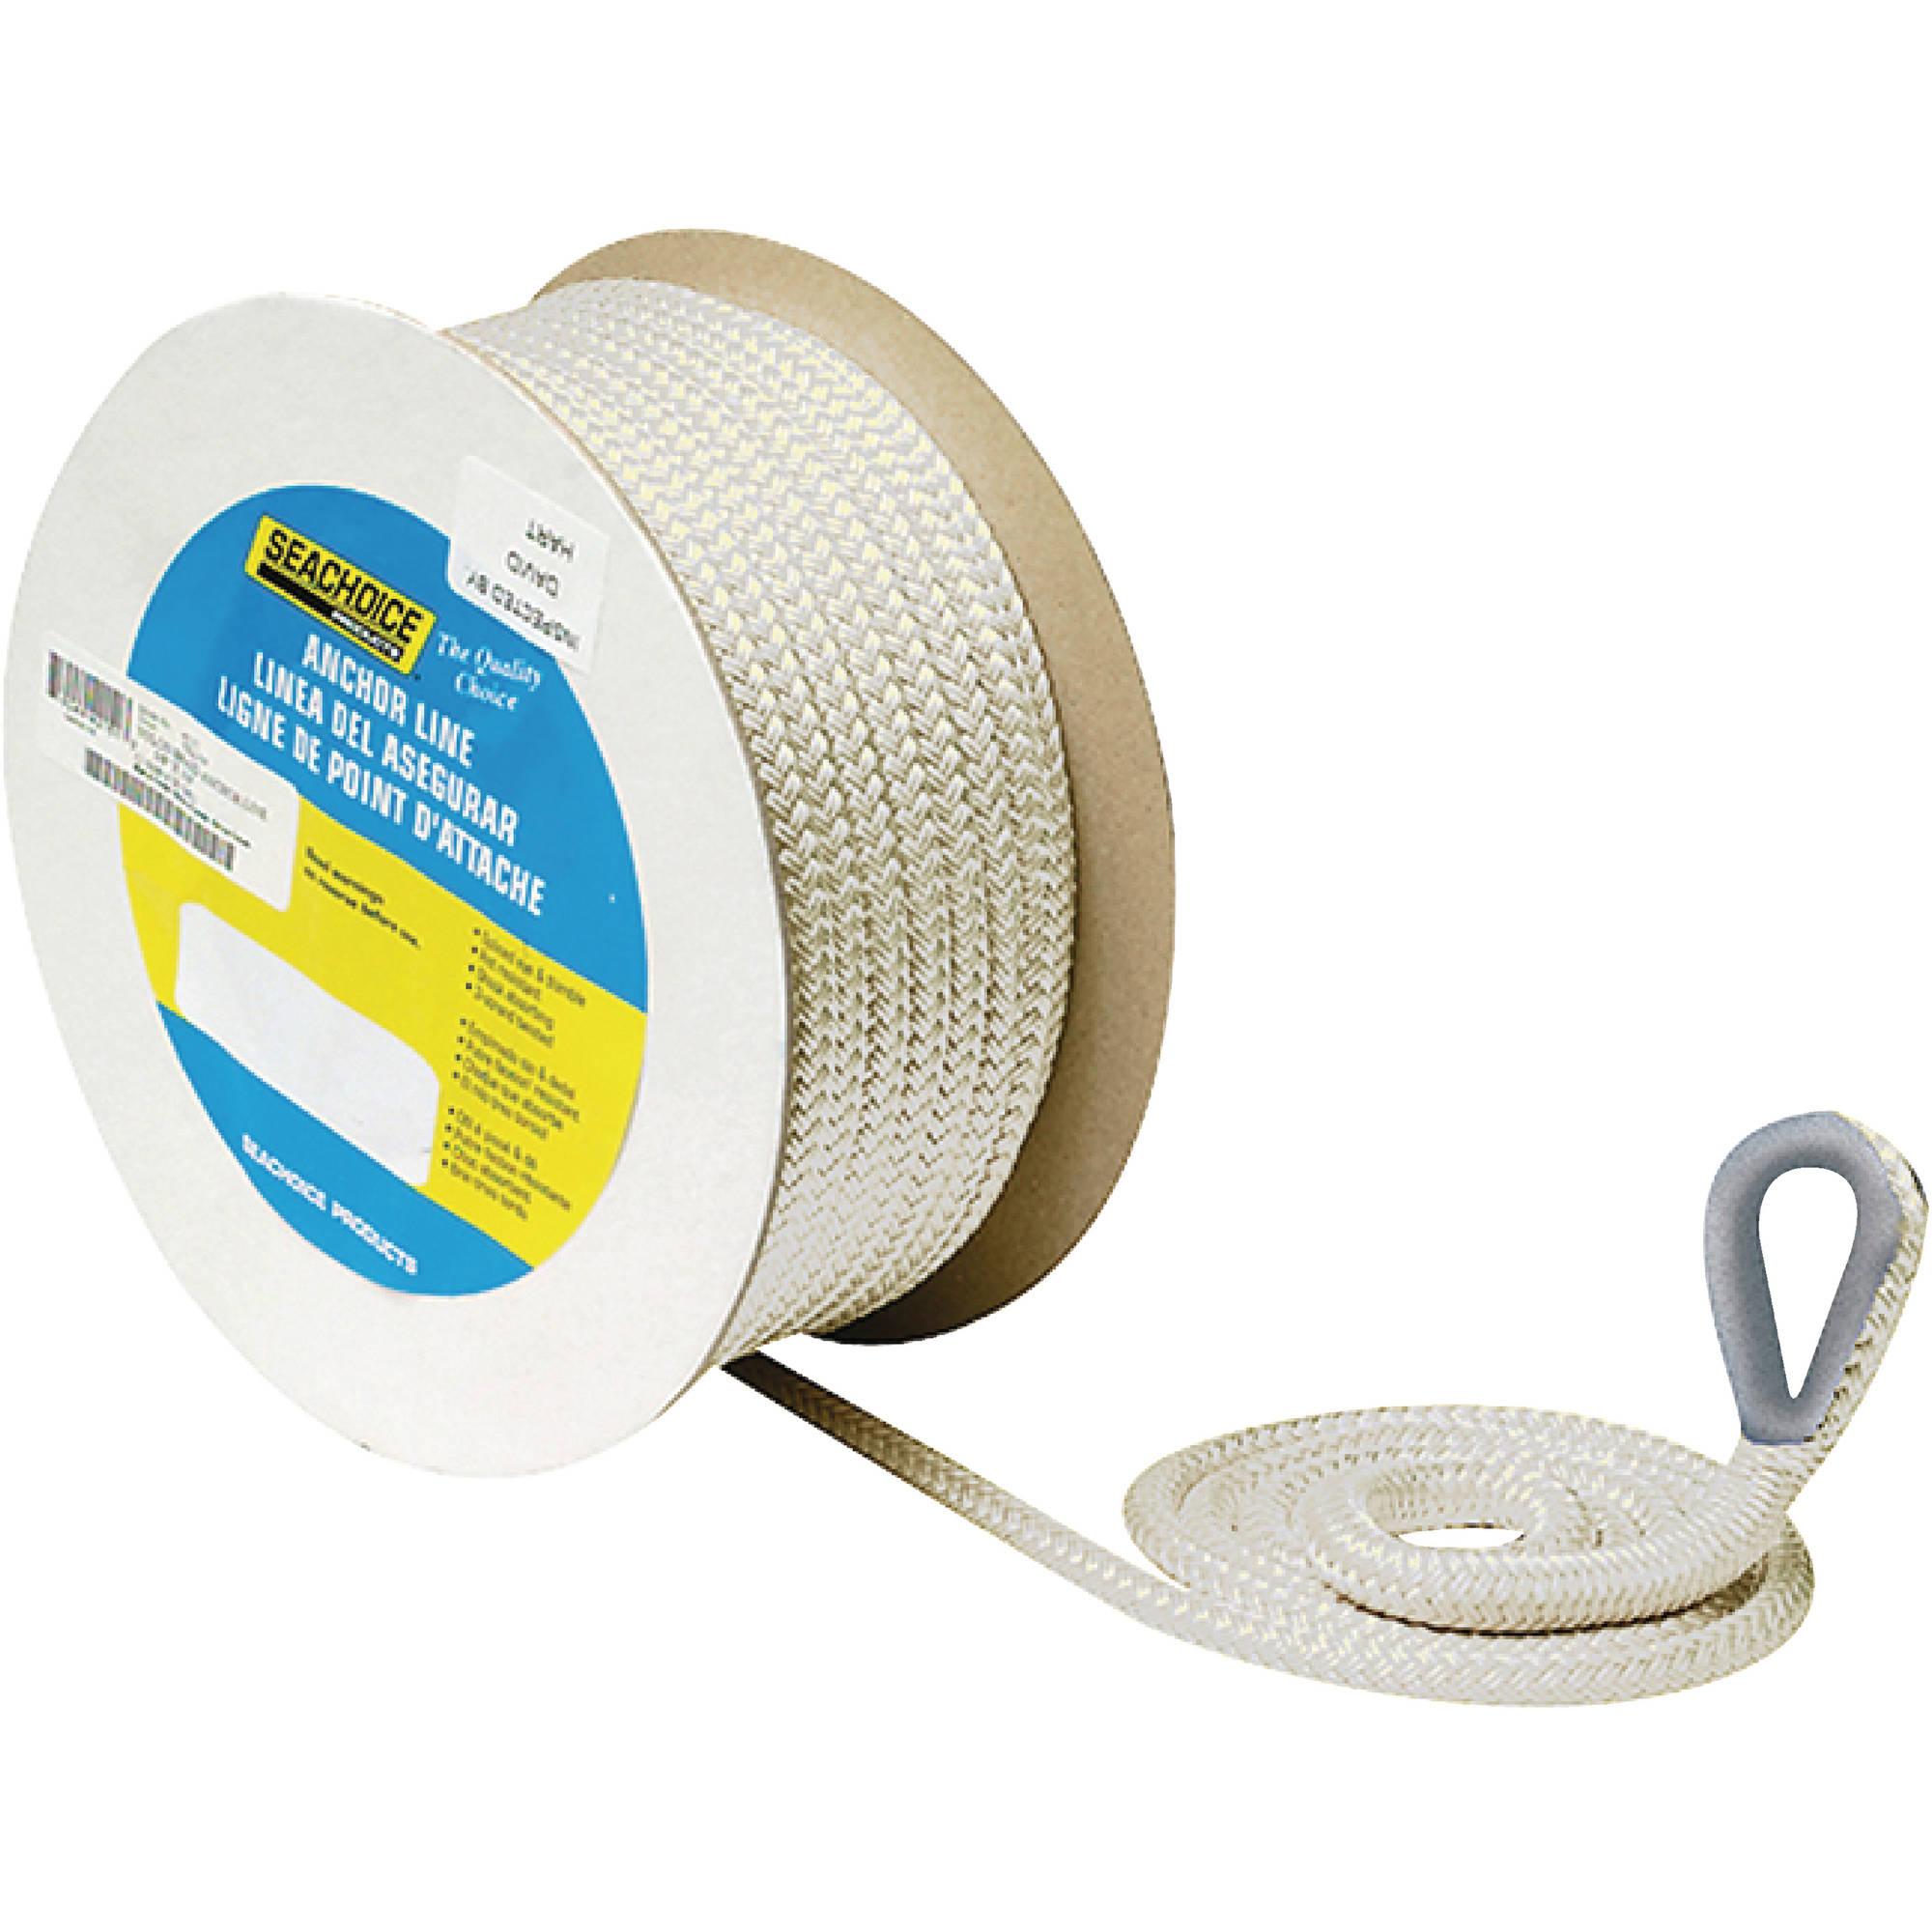 Seachoice Double Braid Nylon Anchor Line, White